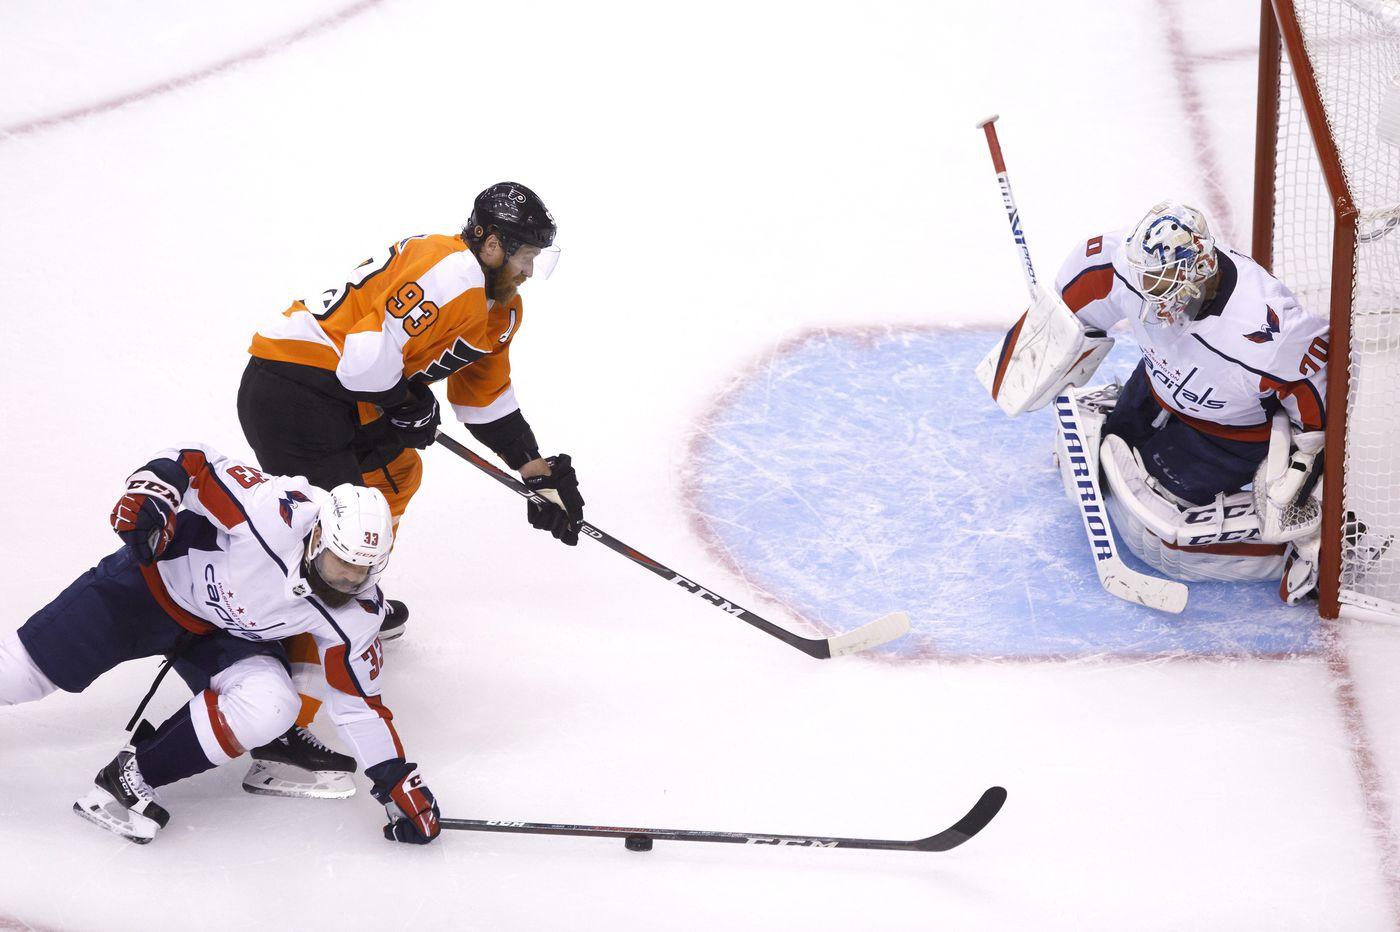 Flyers prepare to meet underdog (but dangerous) Habs in first round; Jake Voracek back at practice